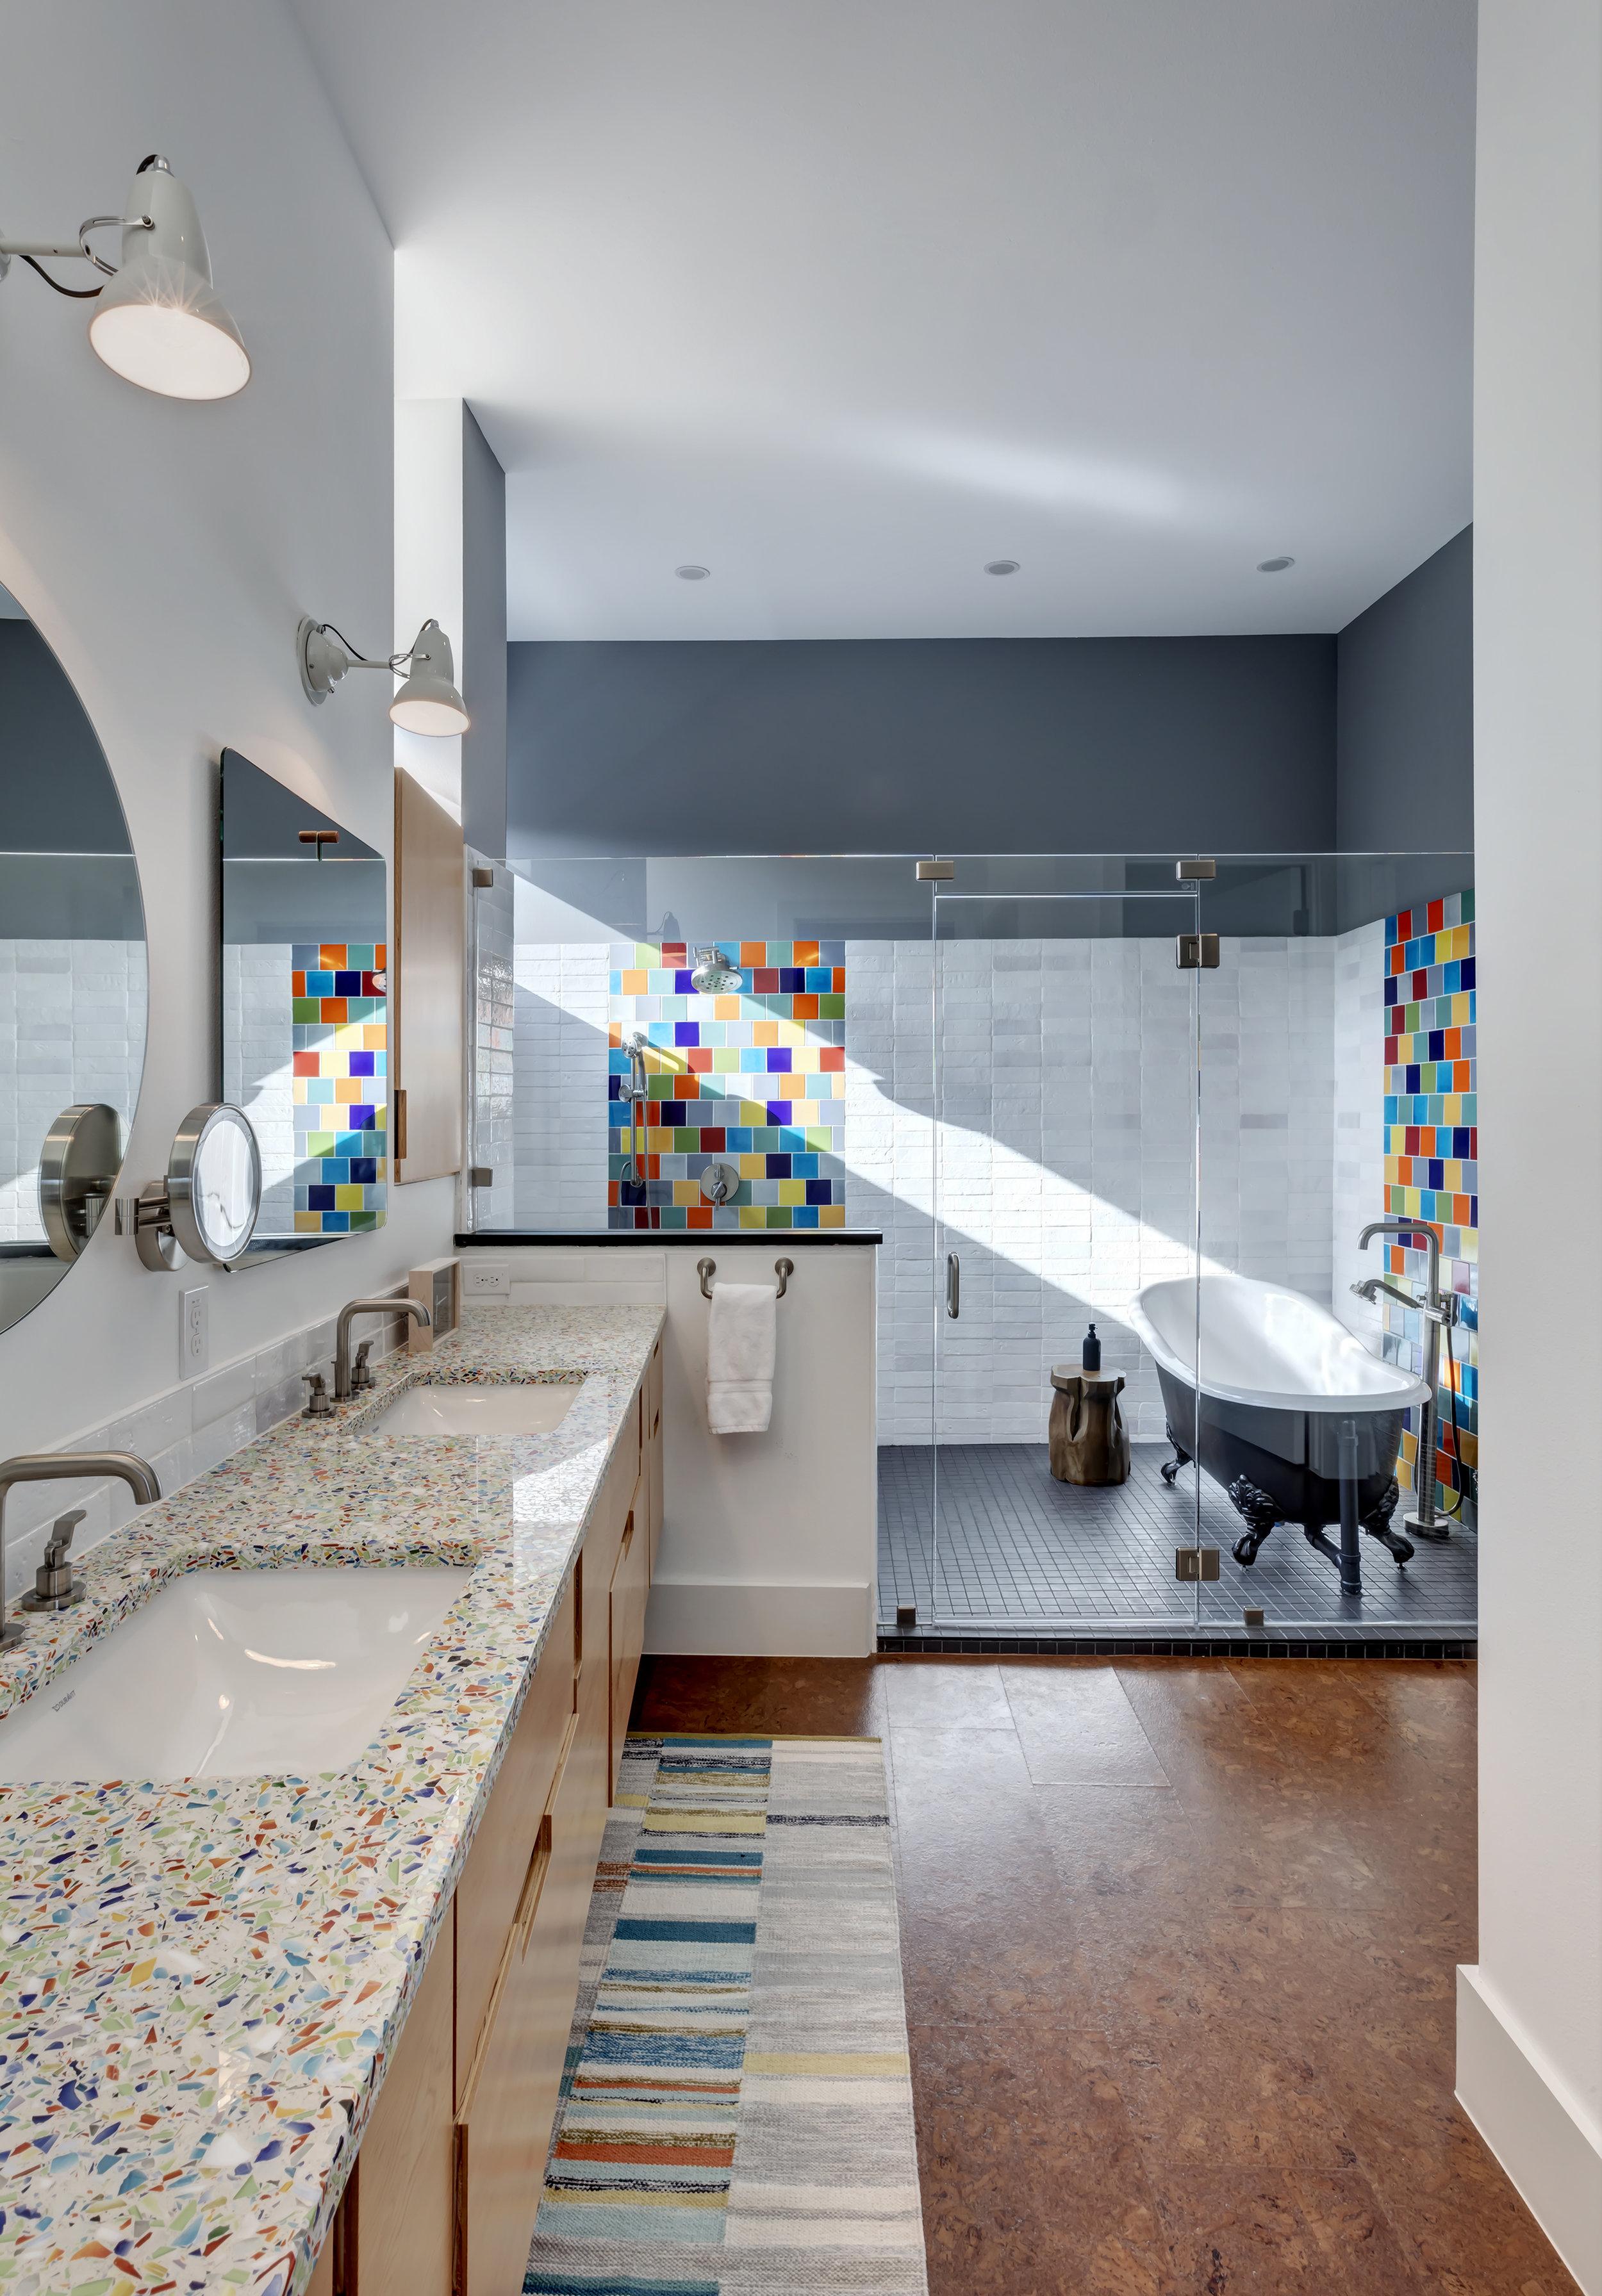 16 Mullet House by Matt Fajkus Architecture. Photo by Charles Davis Smith.jpg